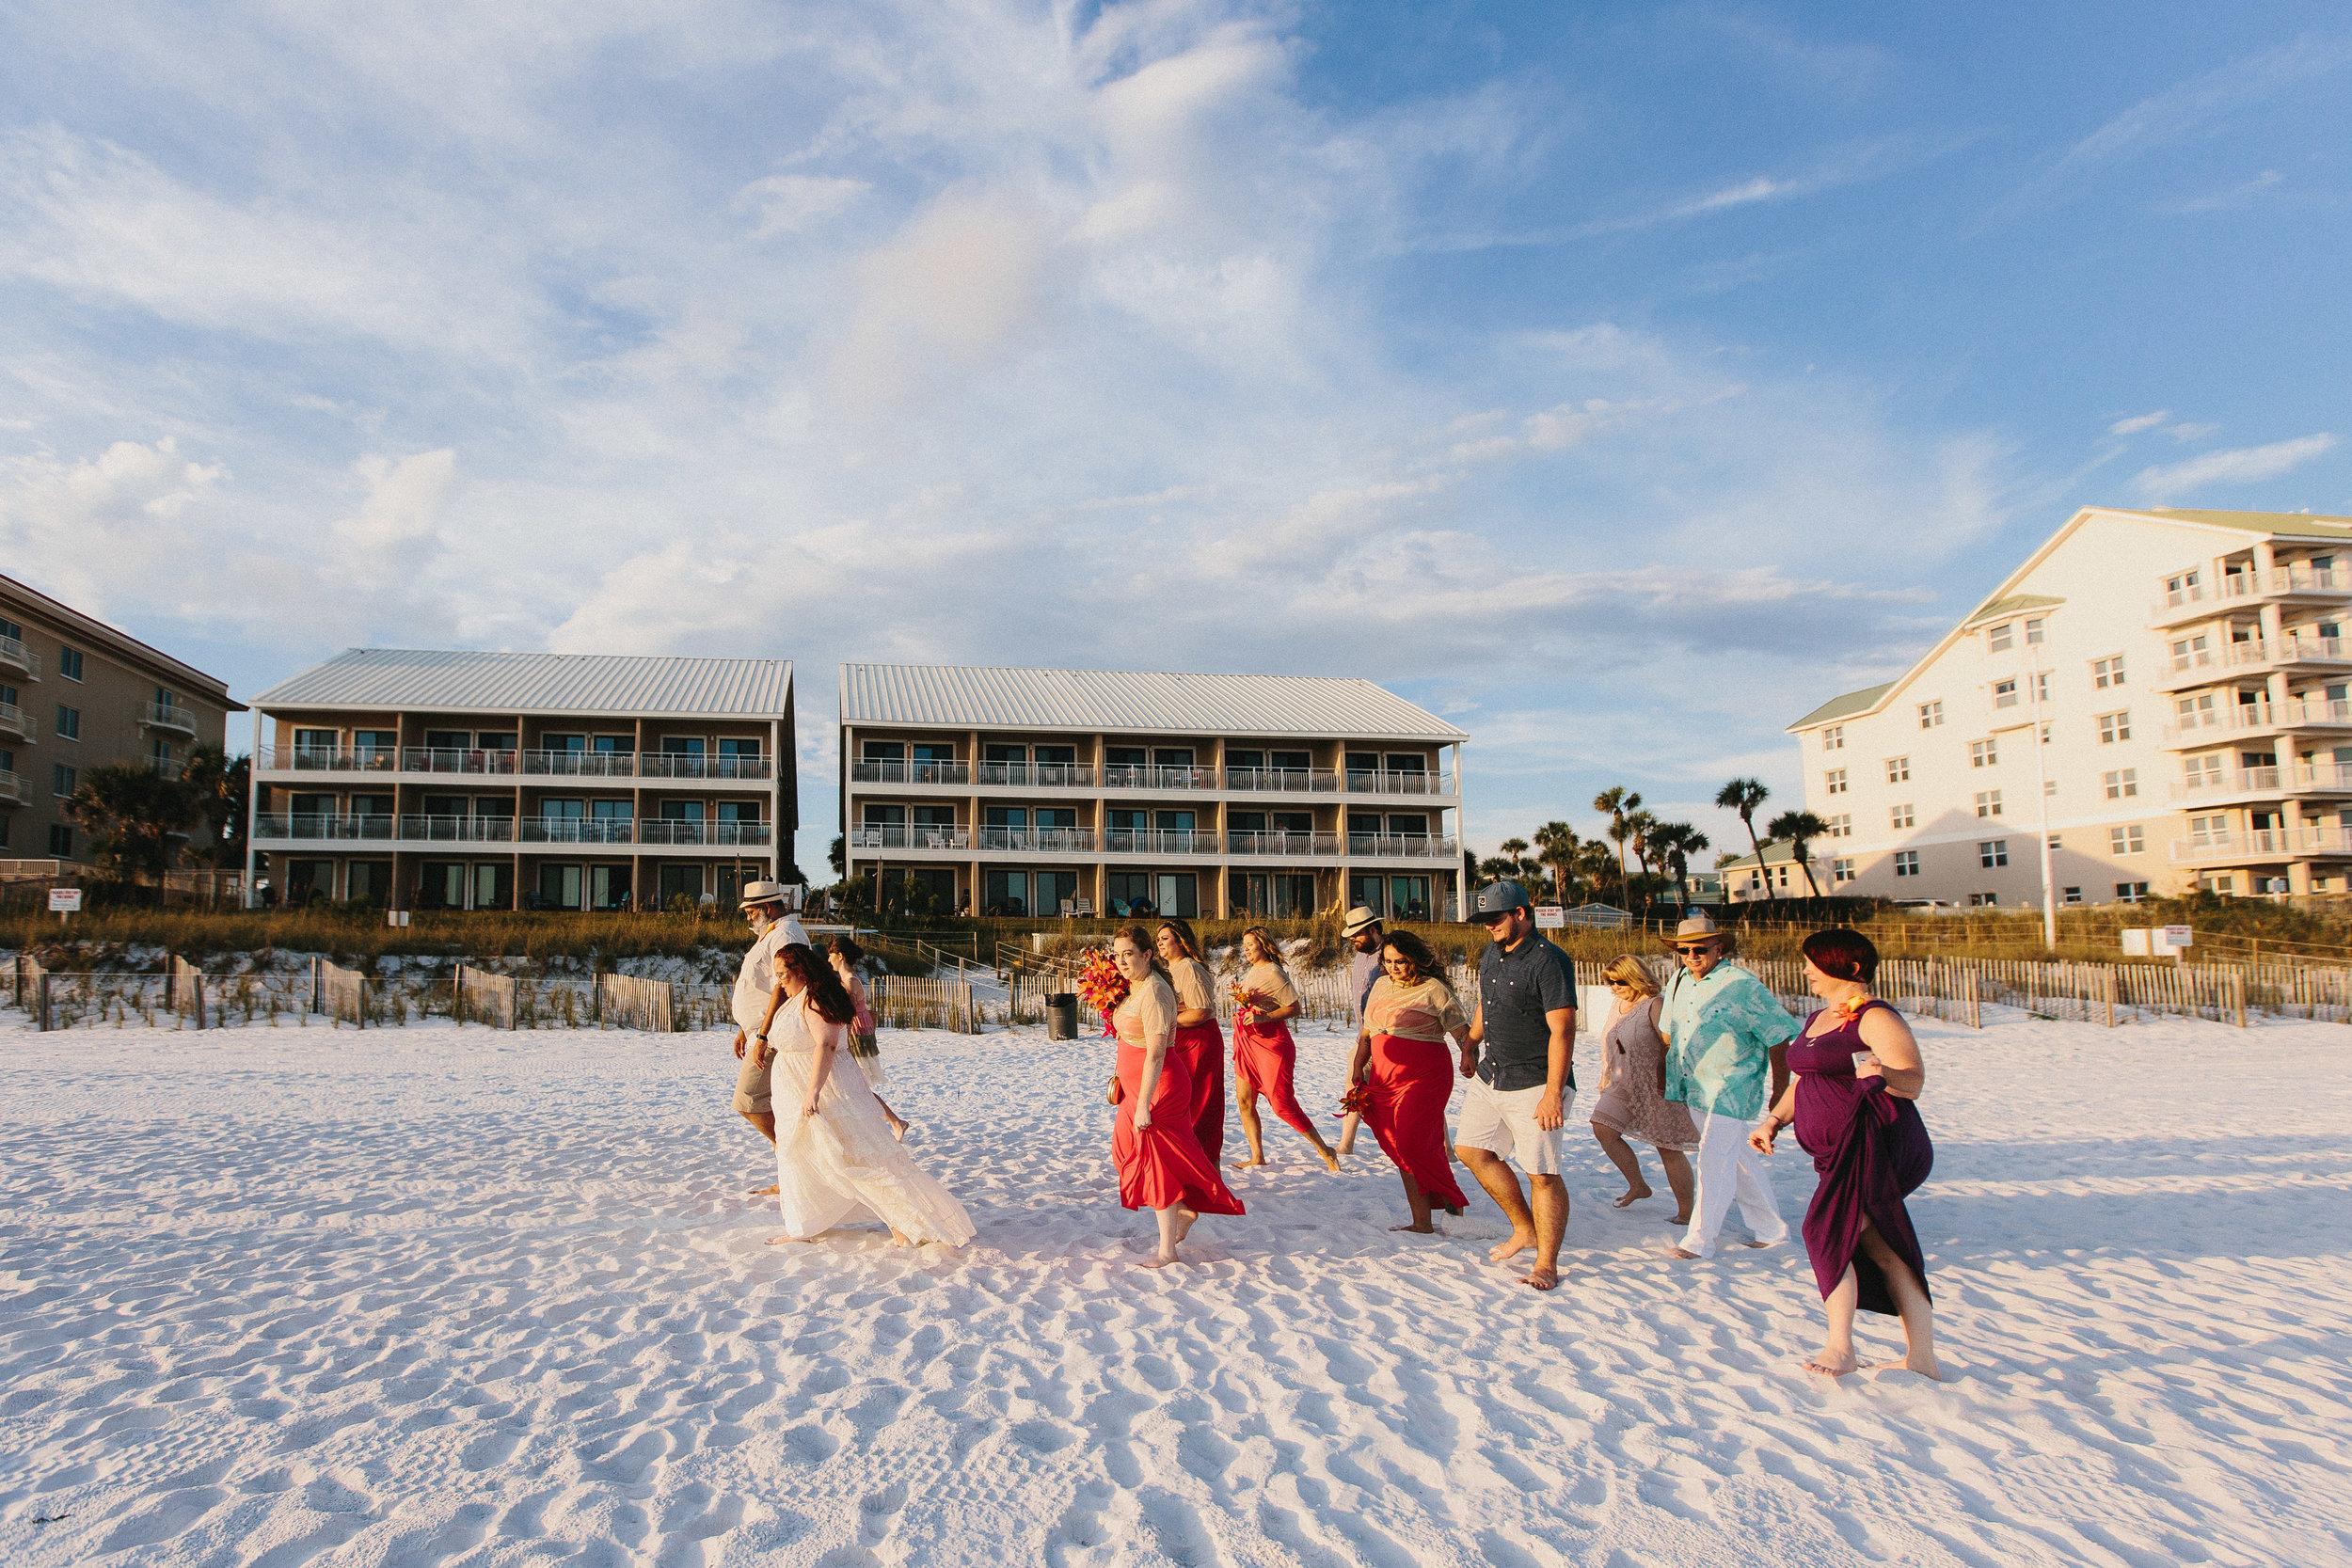 destin_sunset_beach_elopement_intimate_wedding_photographer_florida_documentary_1150.jpg